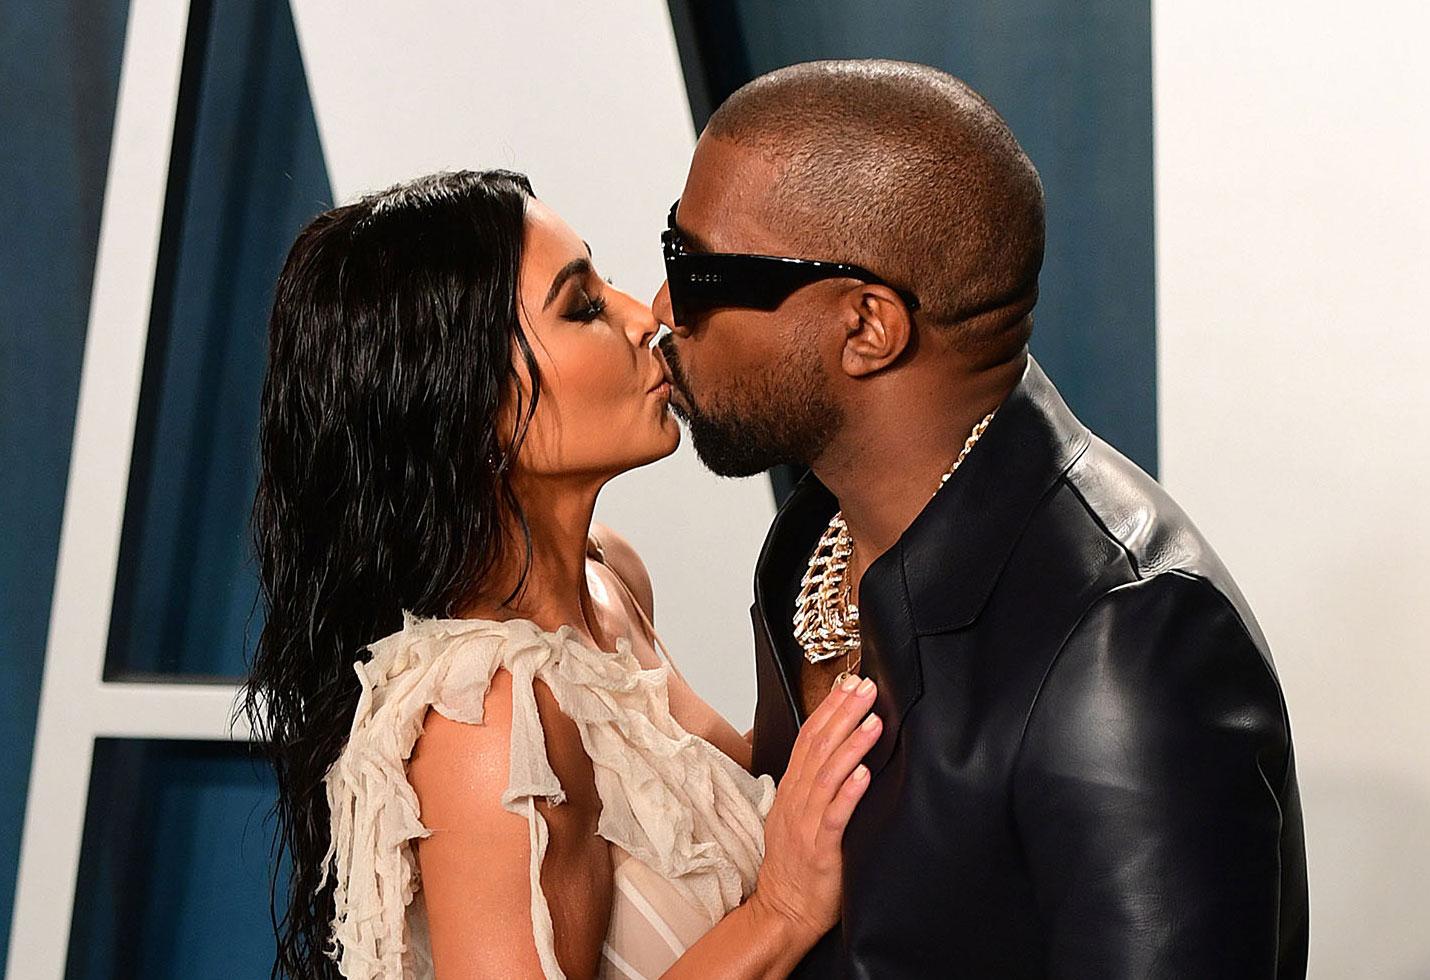 Kim Kardashian and Kanye West Kissing